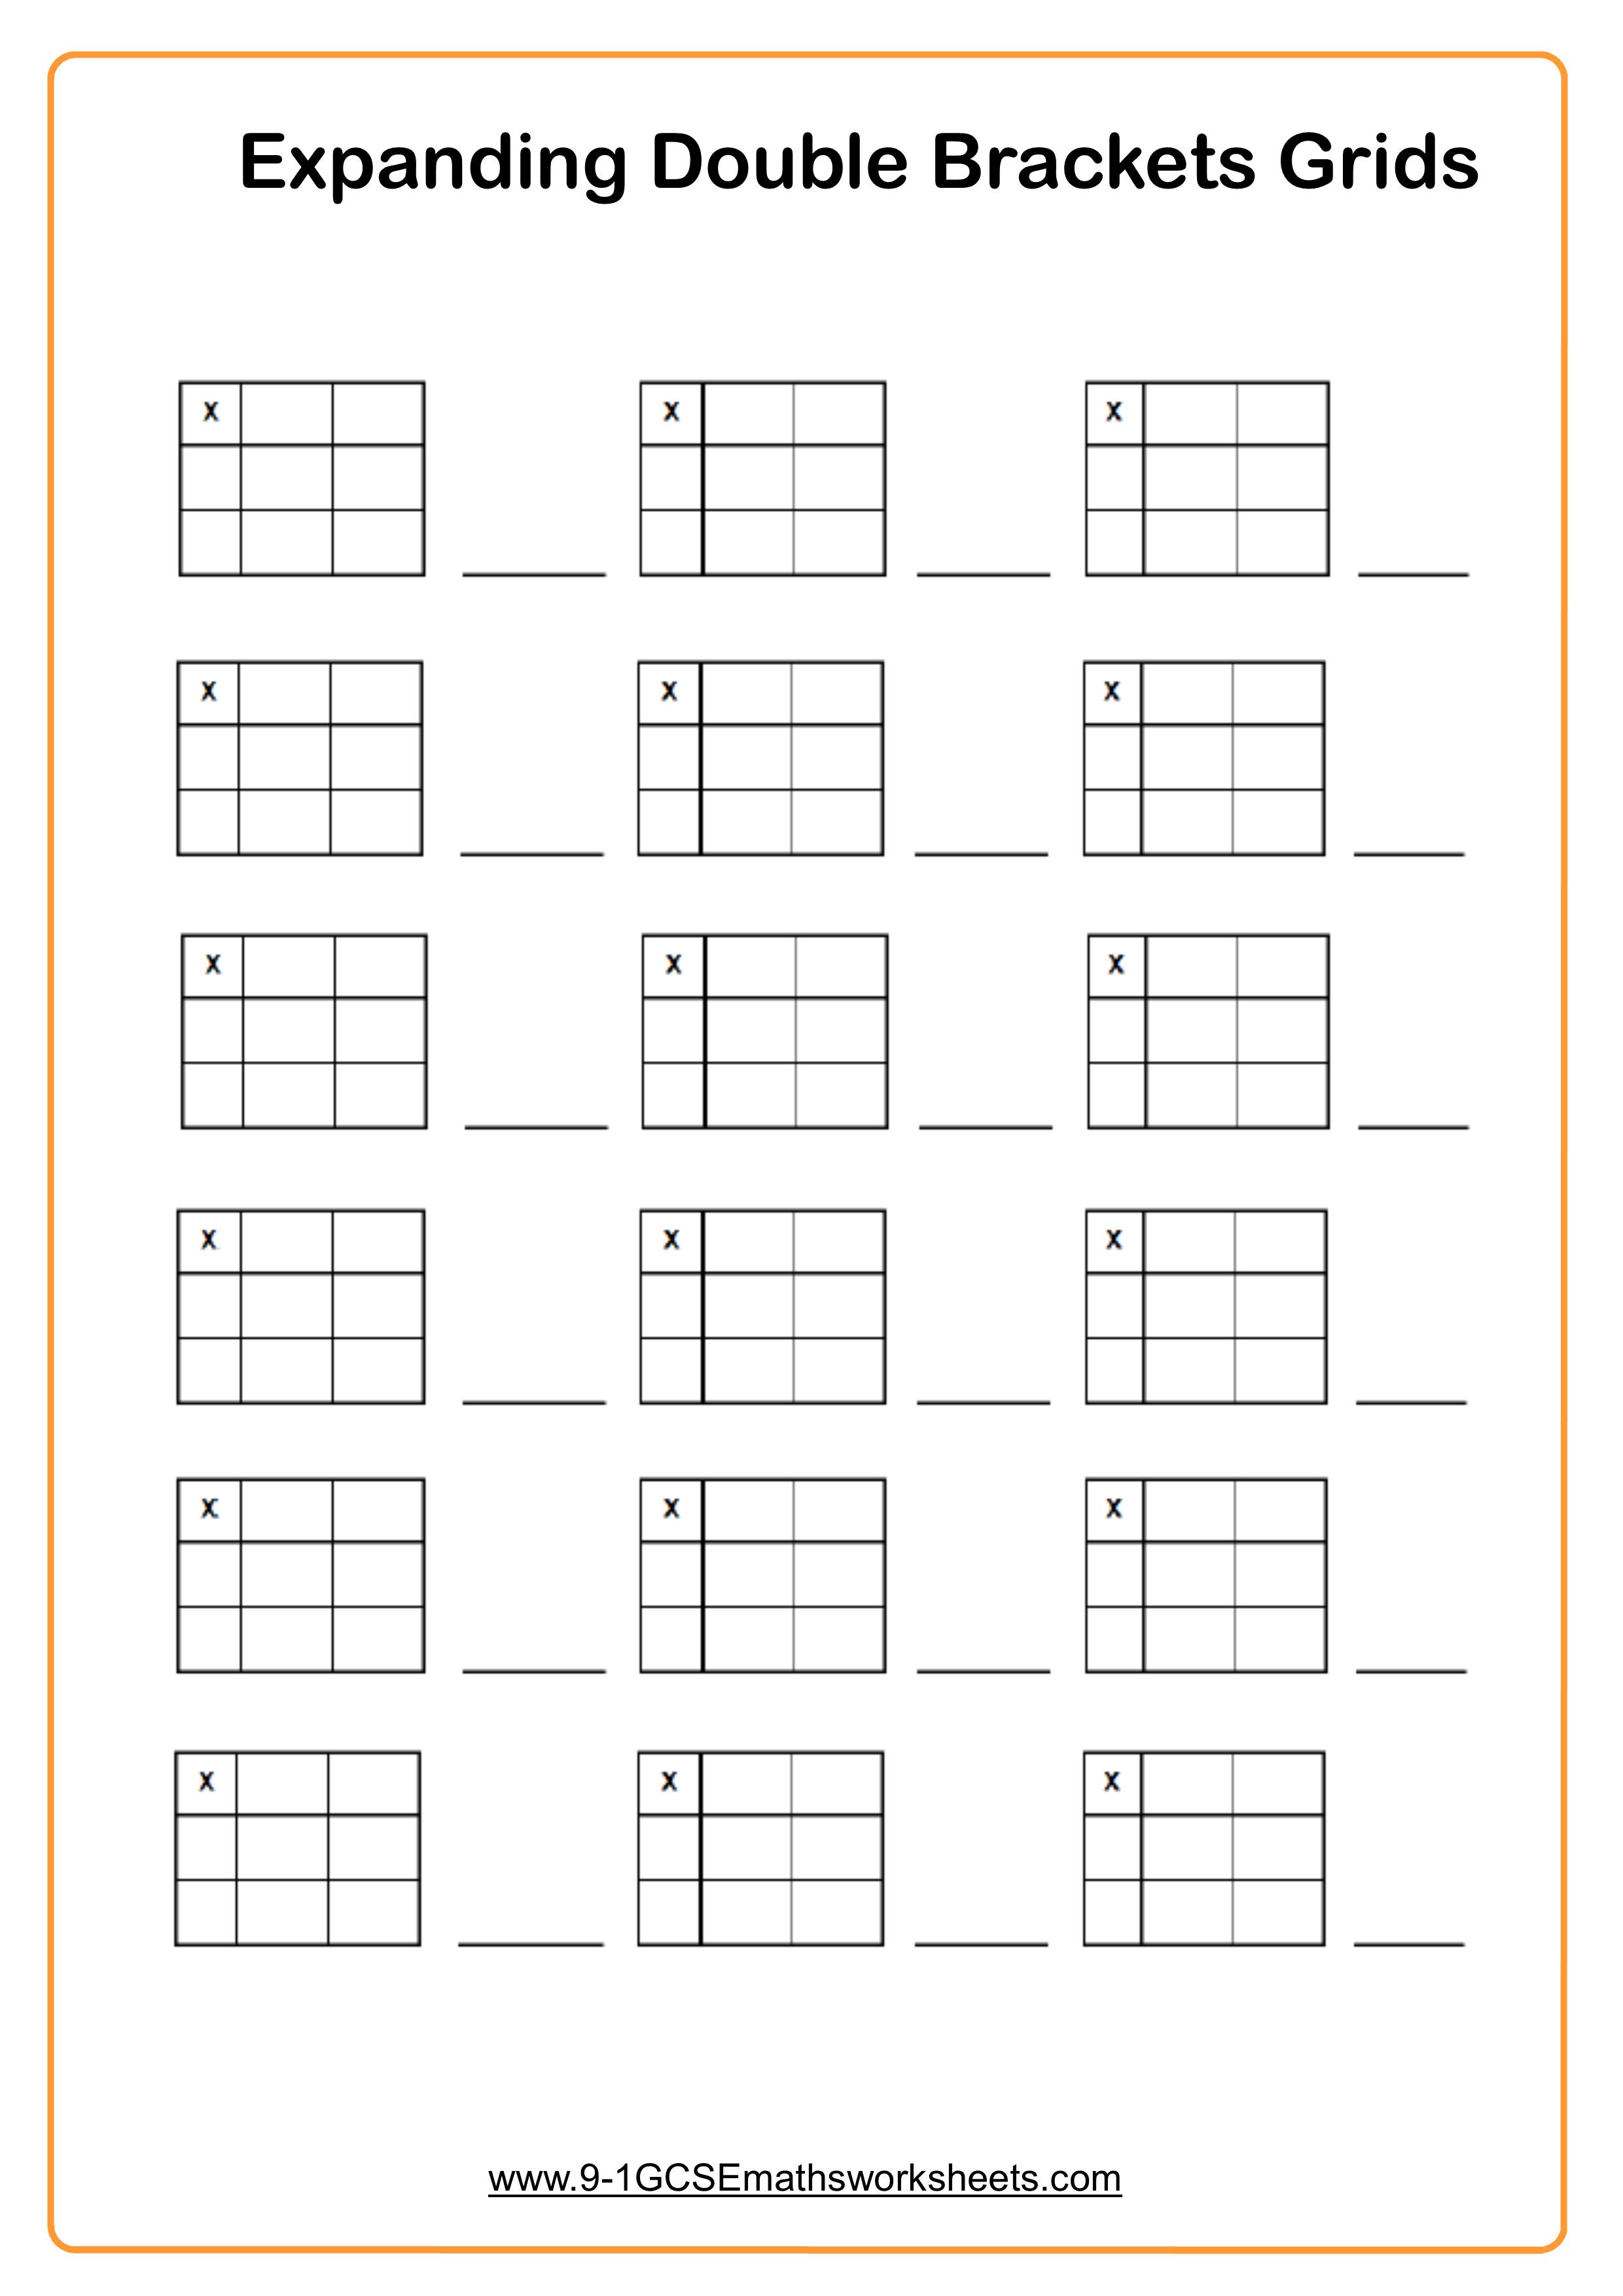 Expanding Double Brackets Grids